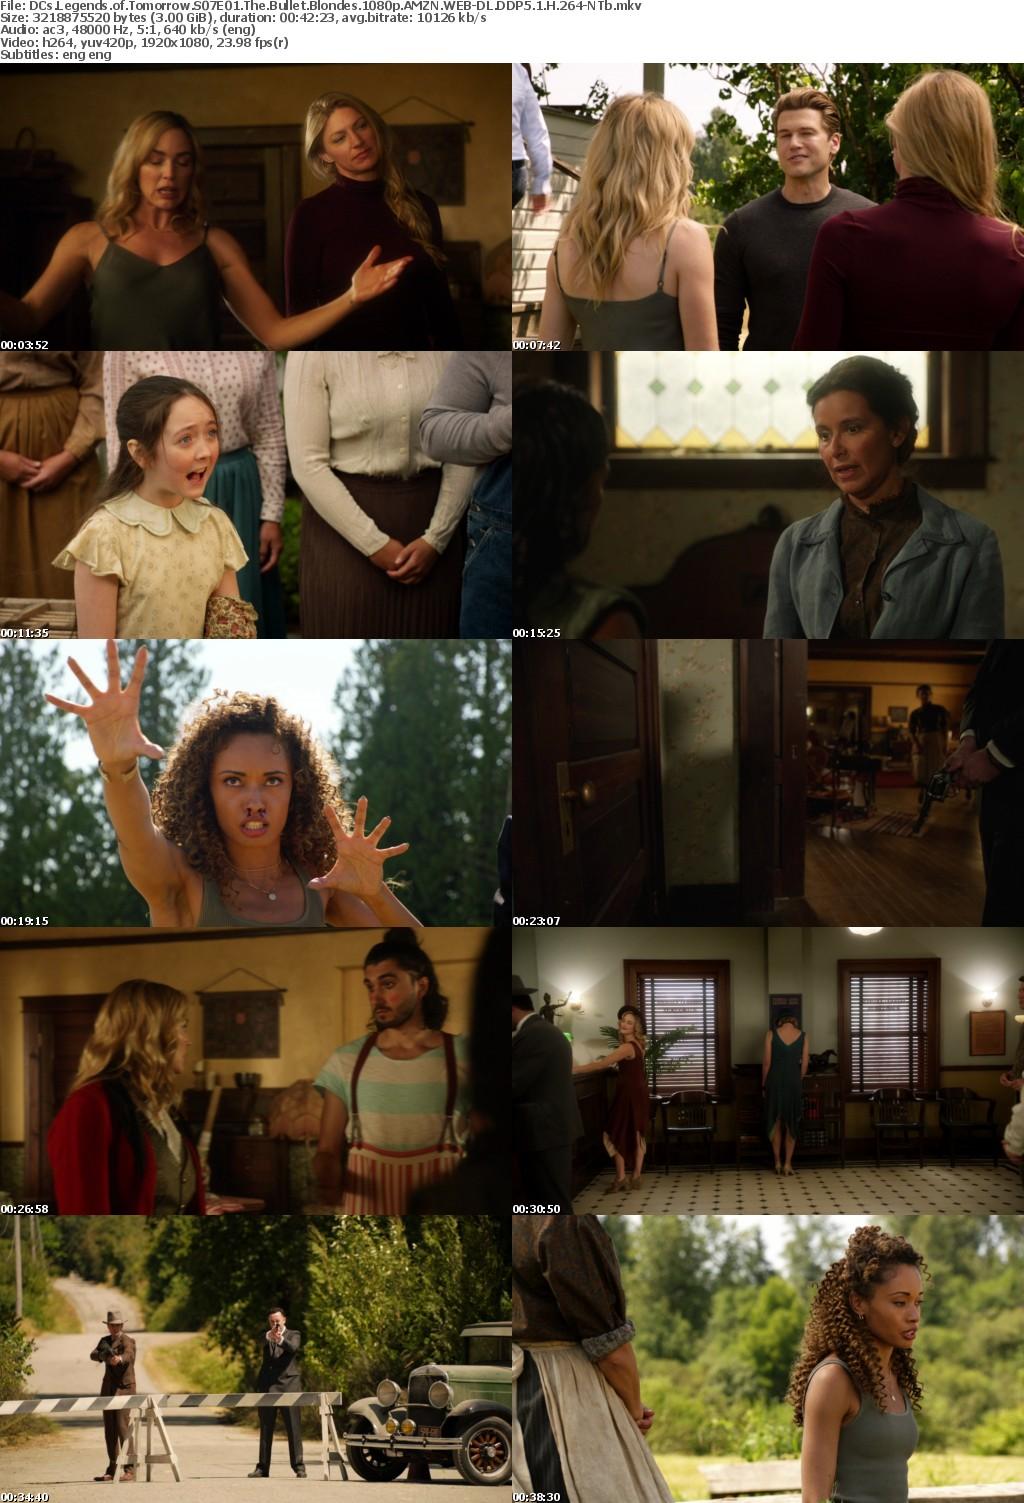 DCs Legends of Tomorrow S07E01 The Bullet Blondes 1080p AMZN WEBRip DDP5 1 x264-NTb